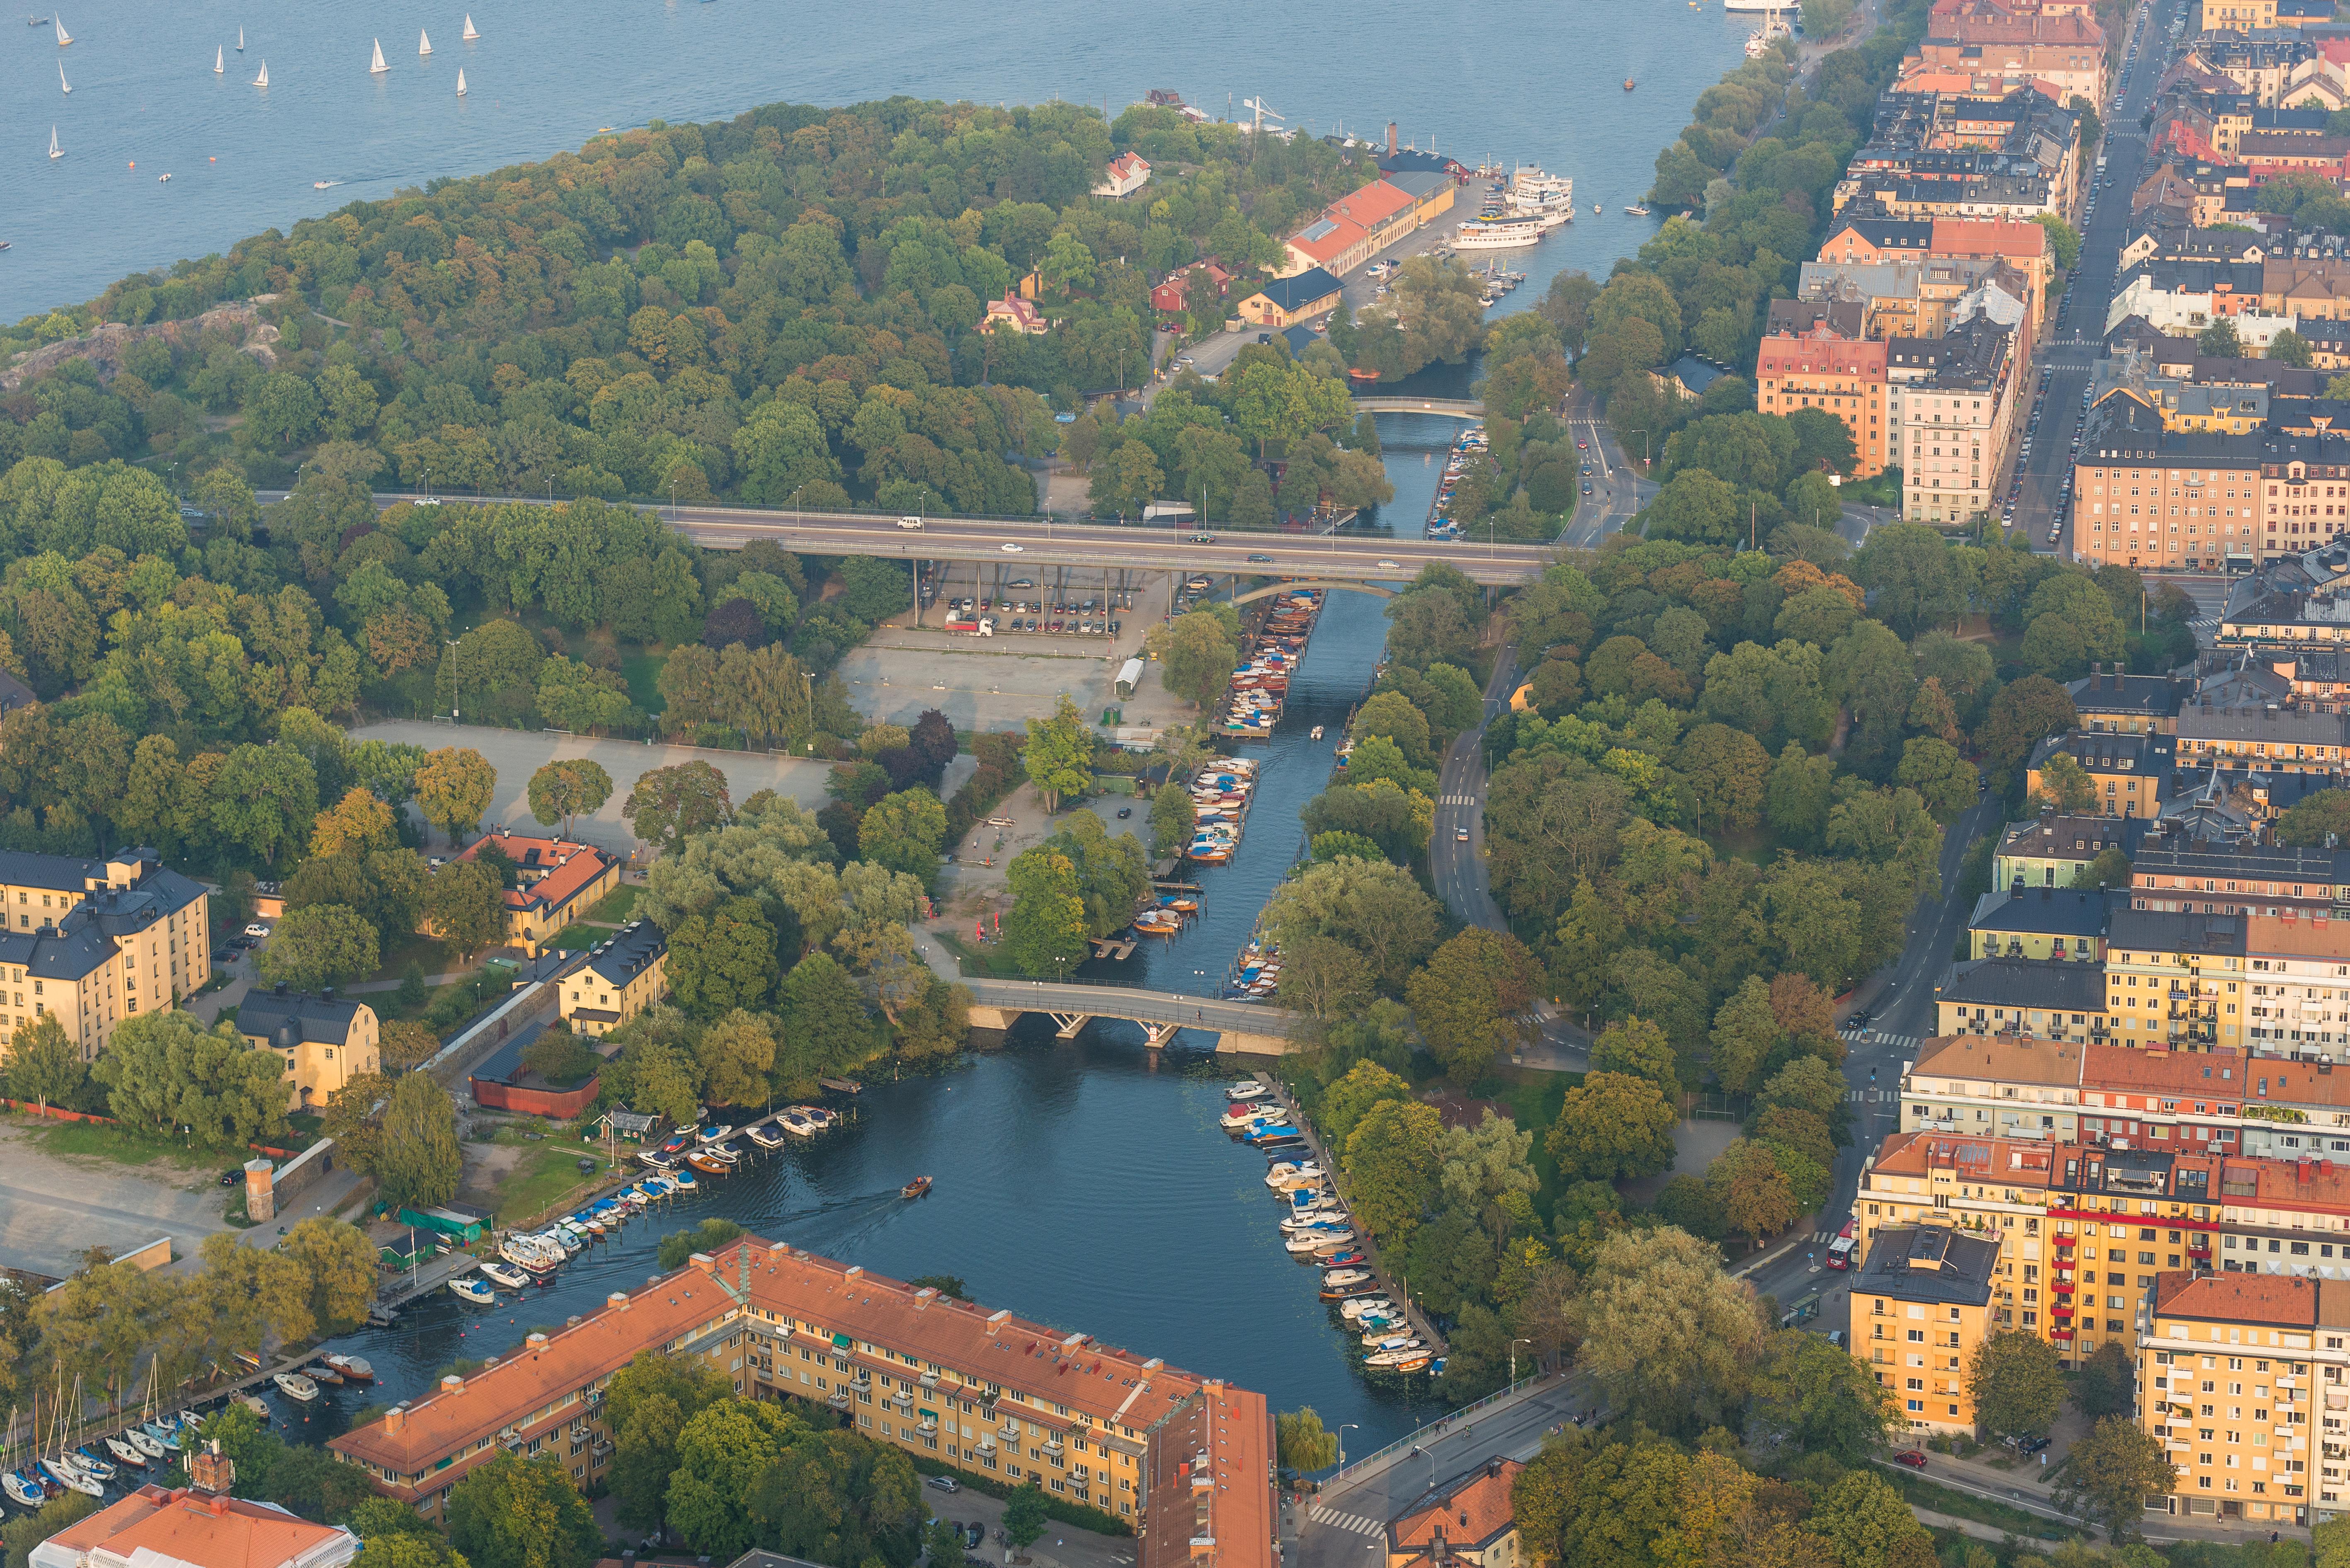 L%C3%A5ngholmen_September_2014.jpg?uselang=de